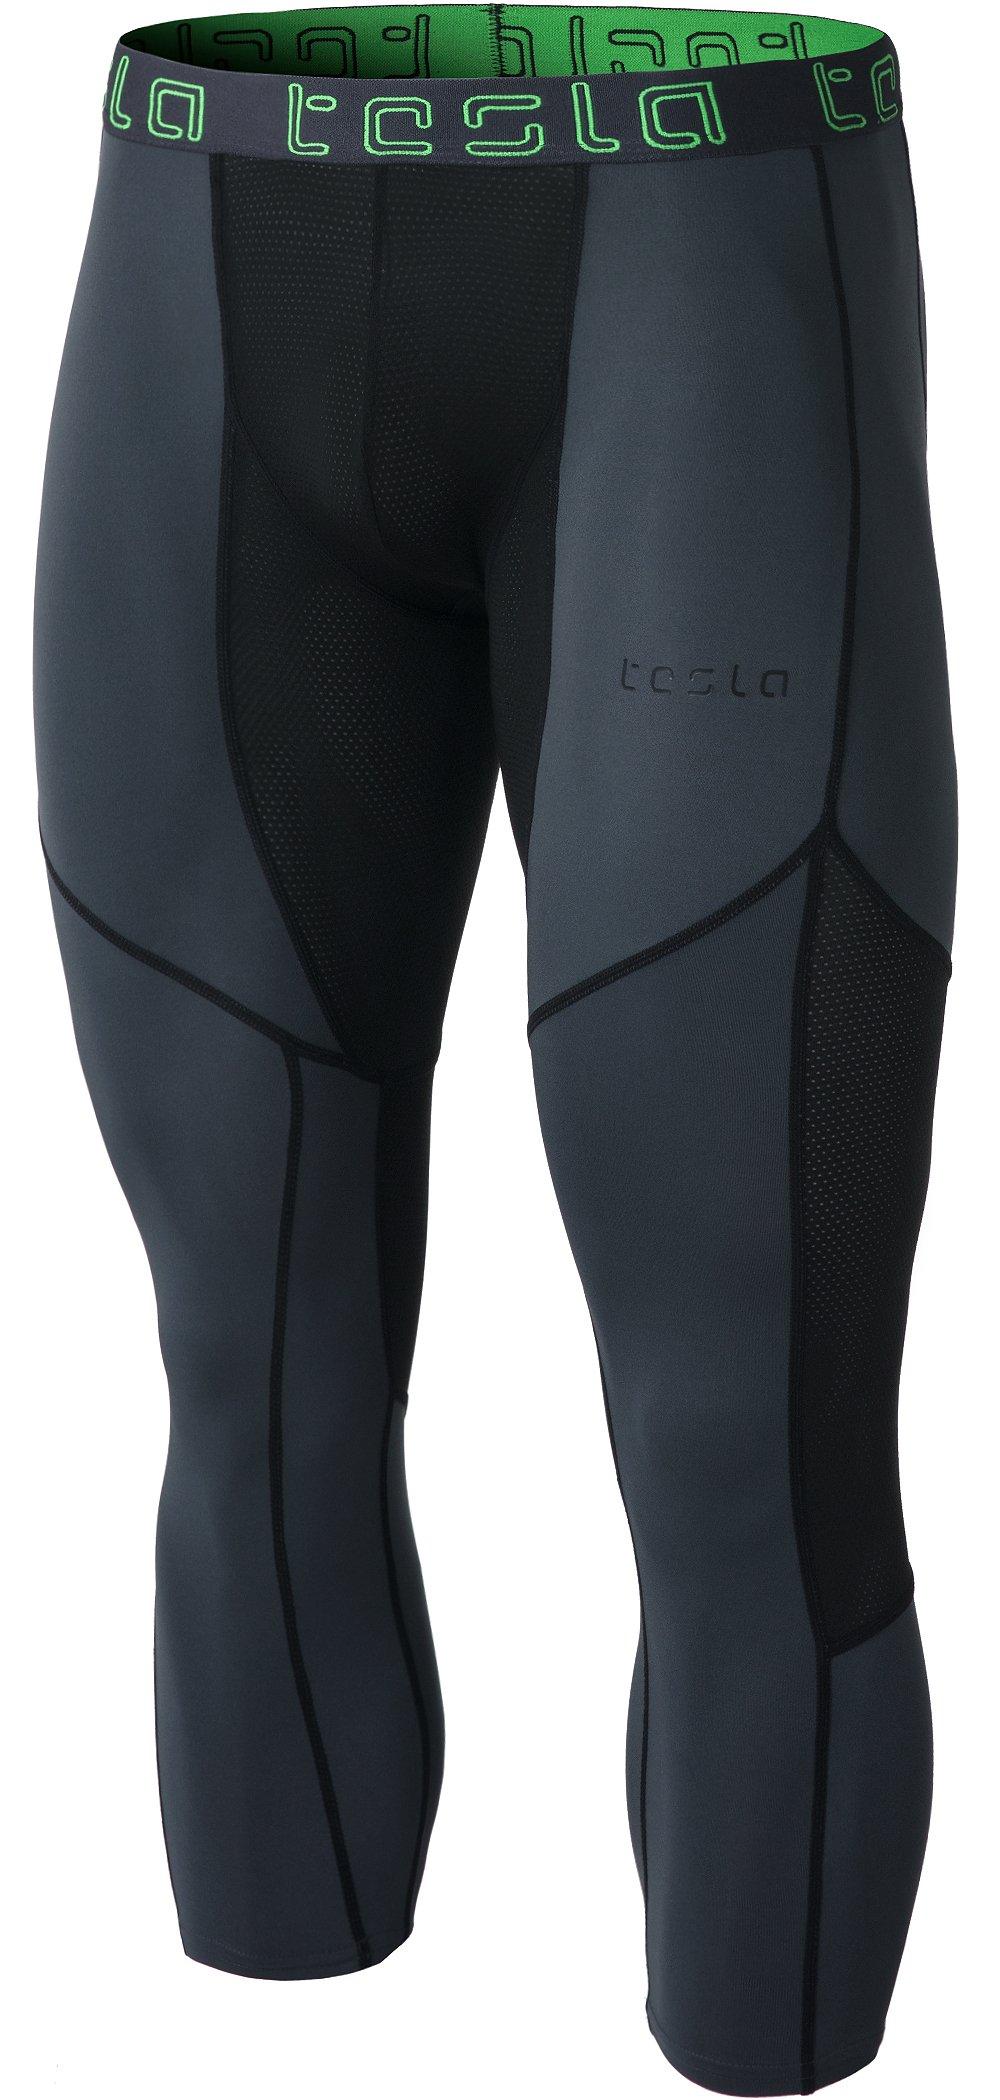 TSLA Men's Mesh-Panel Compression 3/4 Capri Pants Baselayer Cool Dry Sports Running Yoga Tights, Mesh(muc78) - Charcoal & Black, Small by TSLA